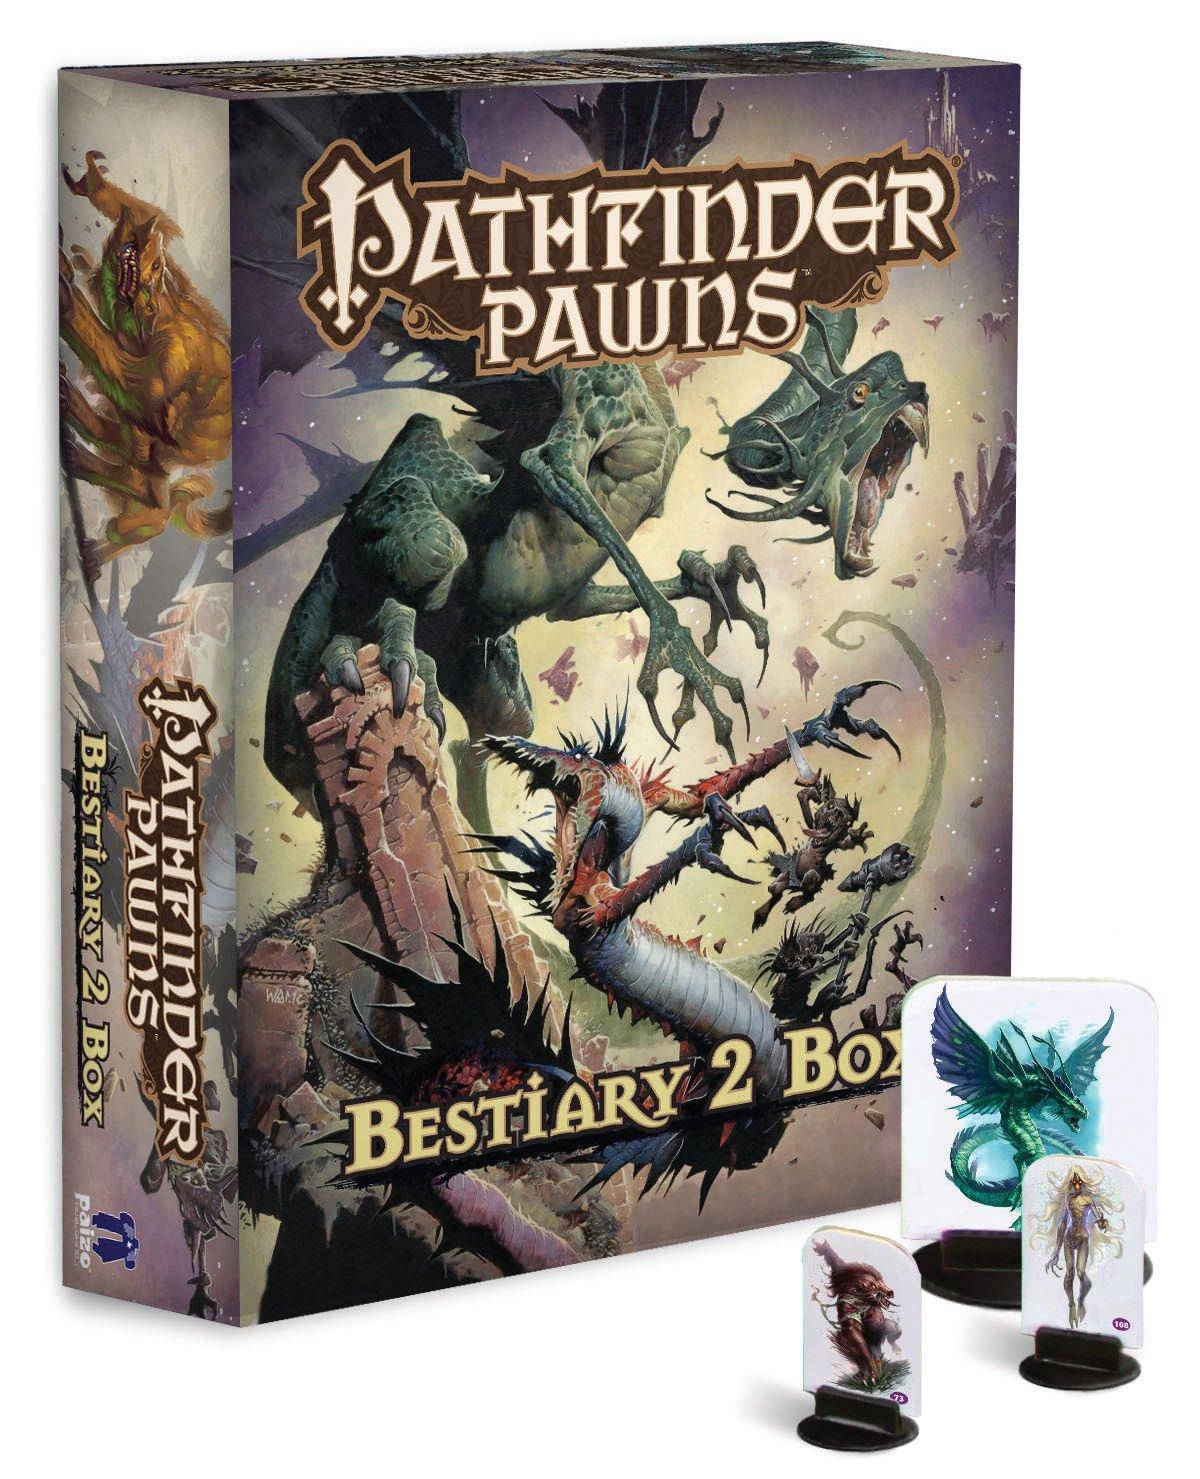 Pathfinder Schachfiguren: Bestiarium 2Box Jason Bulmahn Paizo Publishing PZO1007 Spielen / Raten